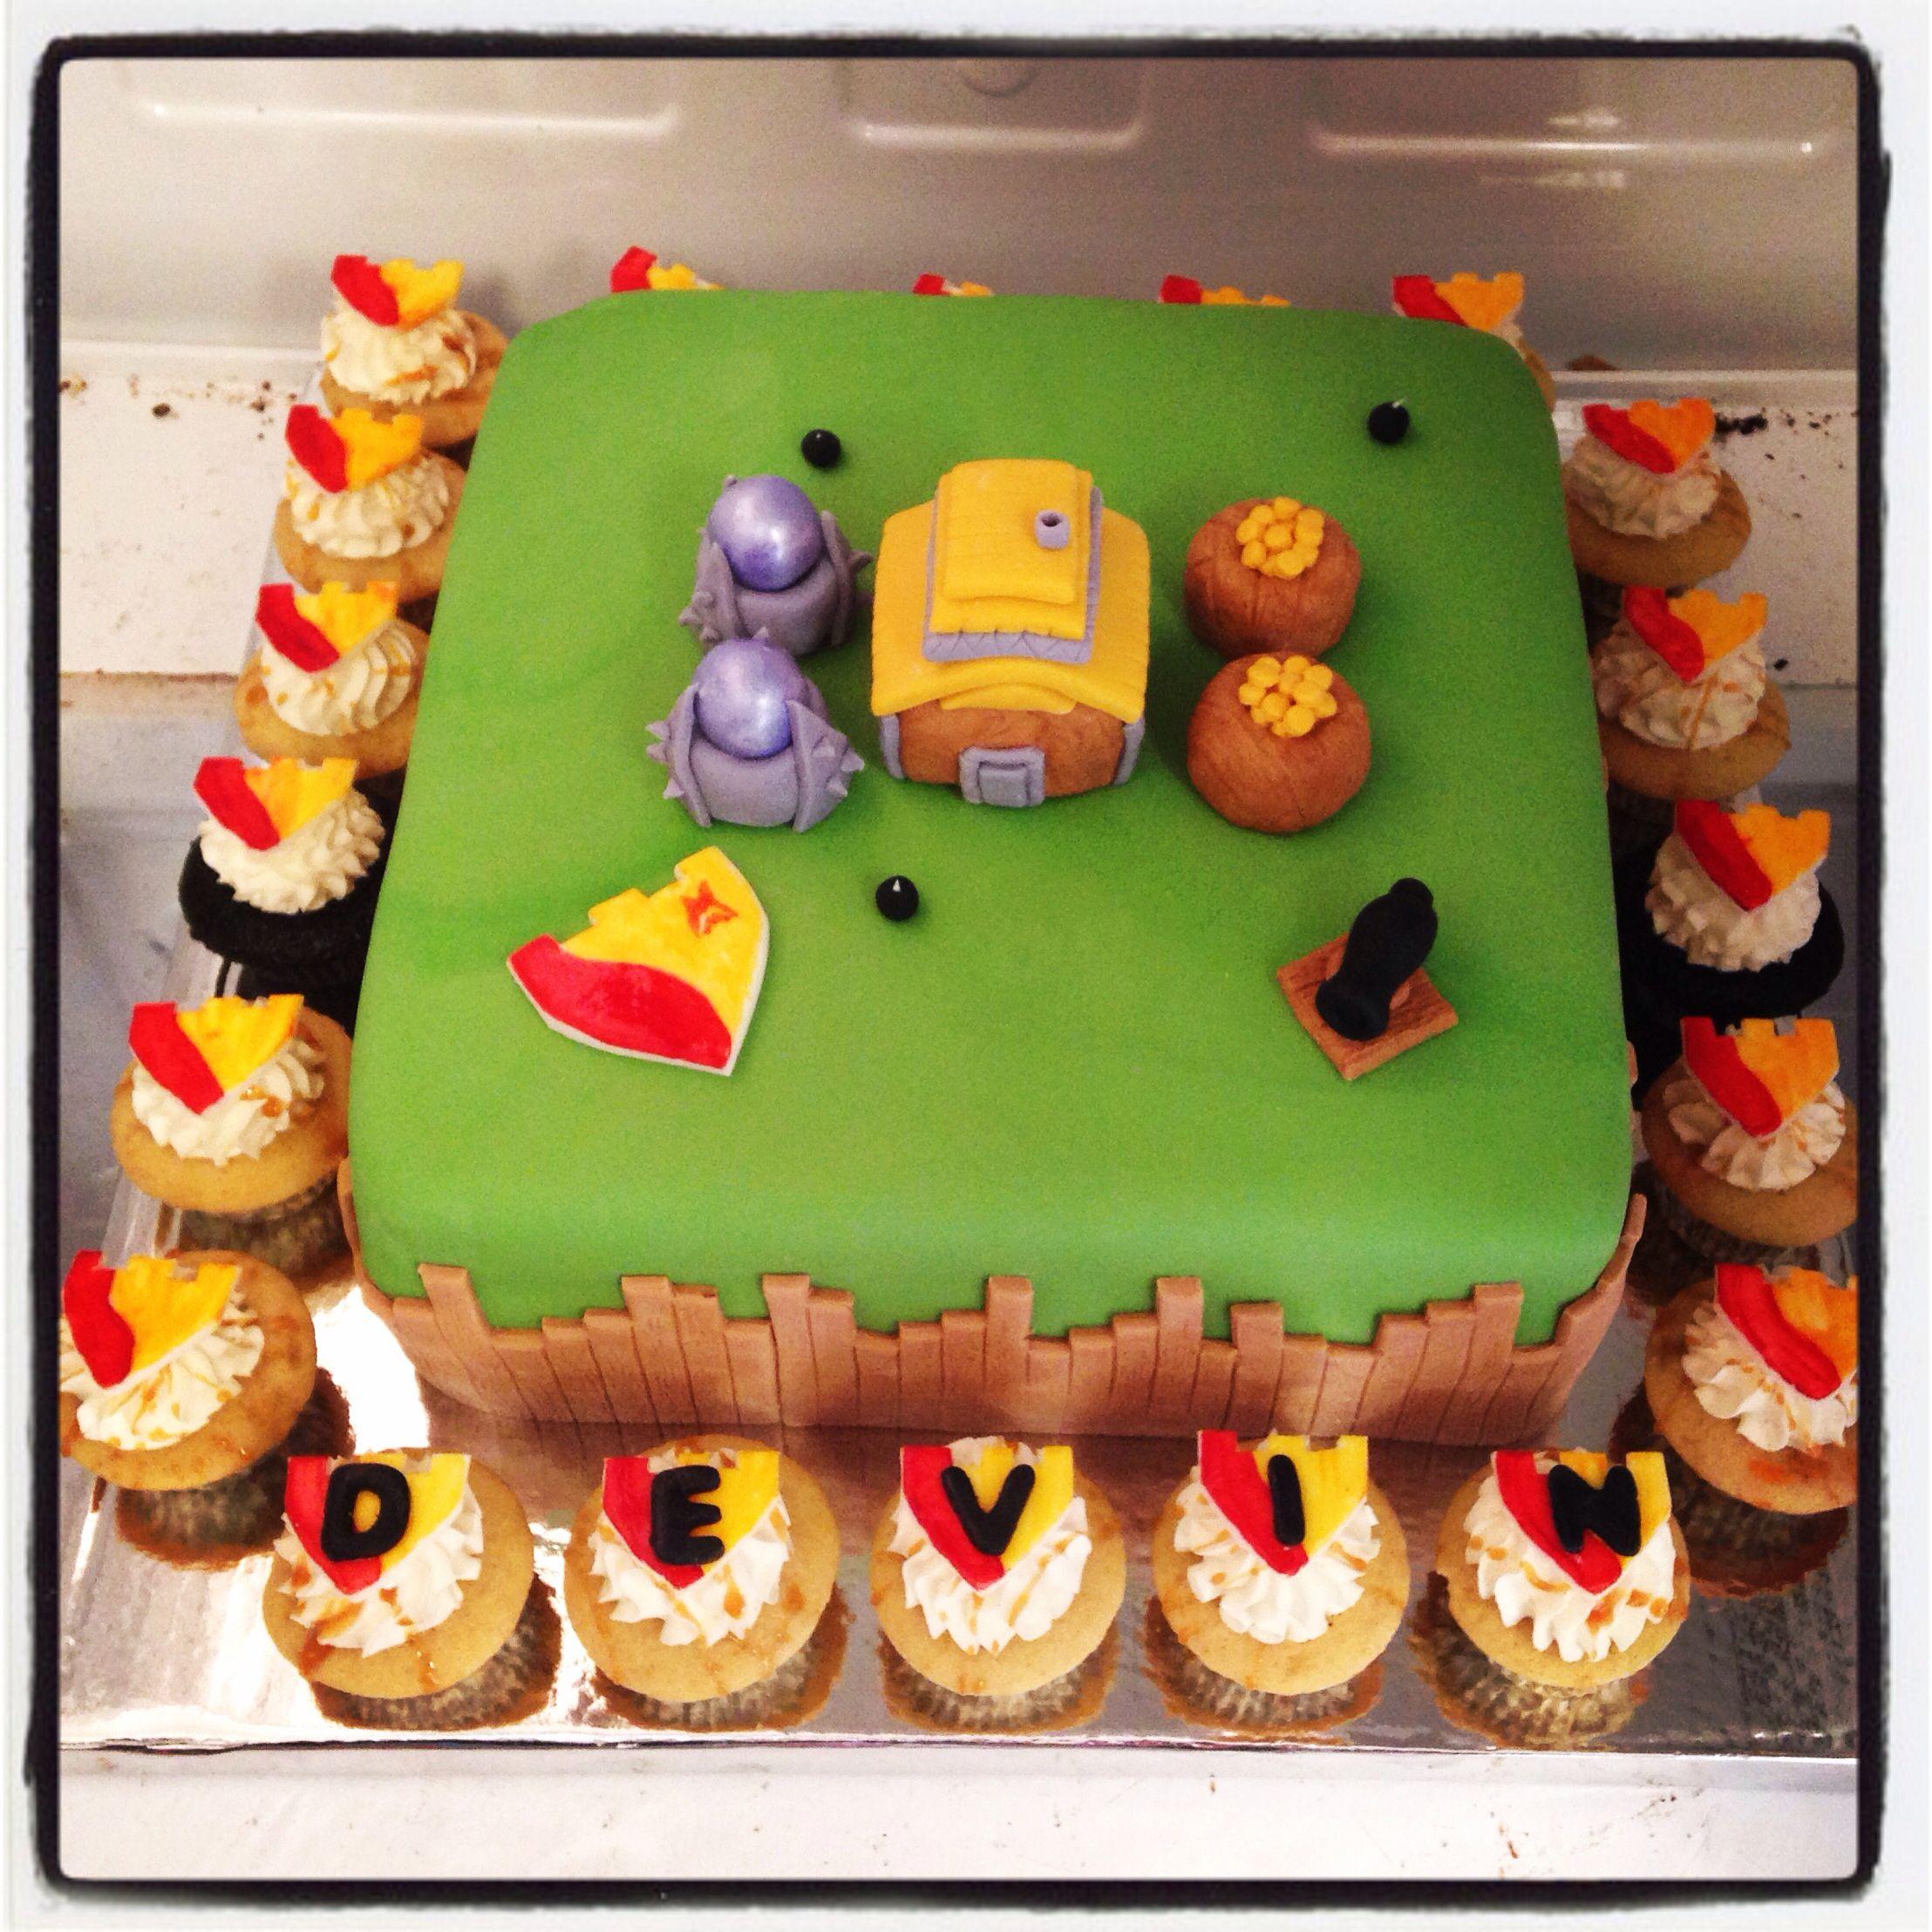 Clash of Clans cake HCG Recipes 4 P2 Pinterest Cake Hcg